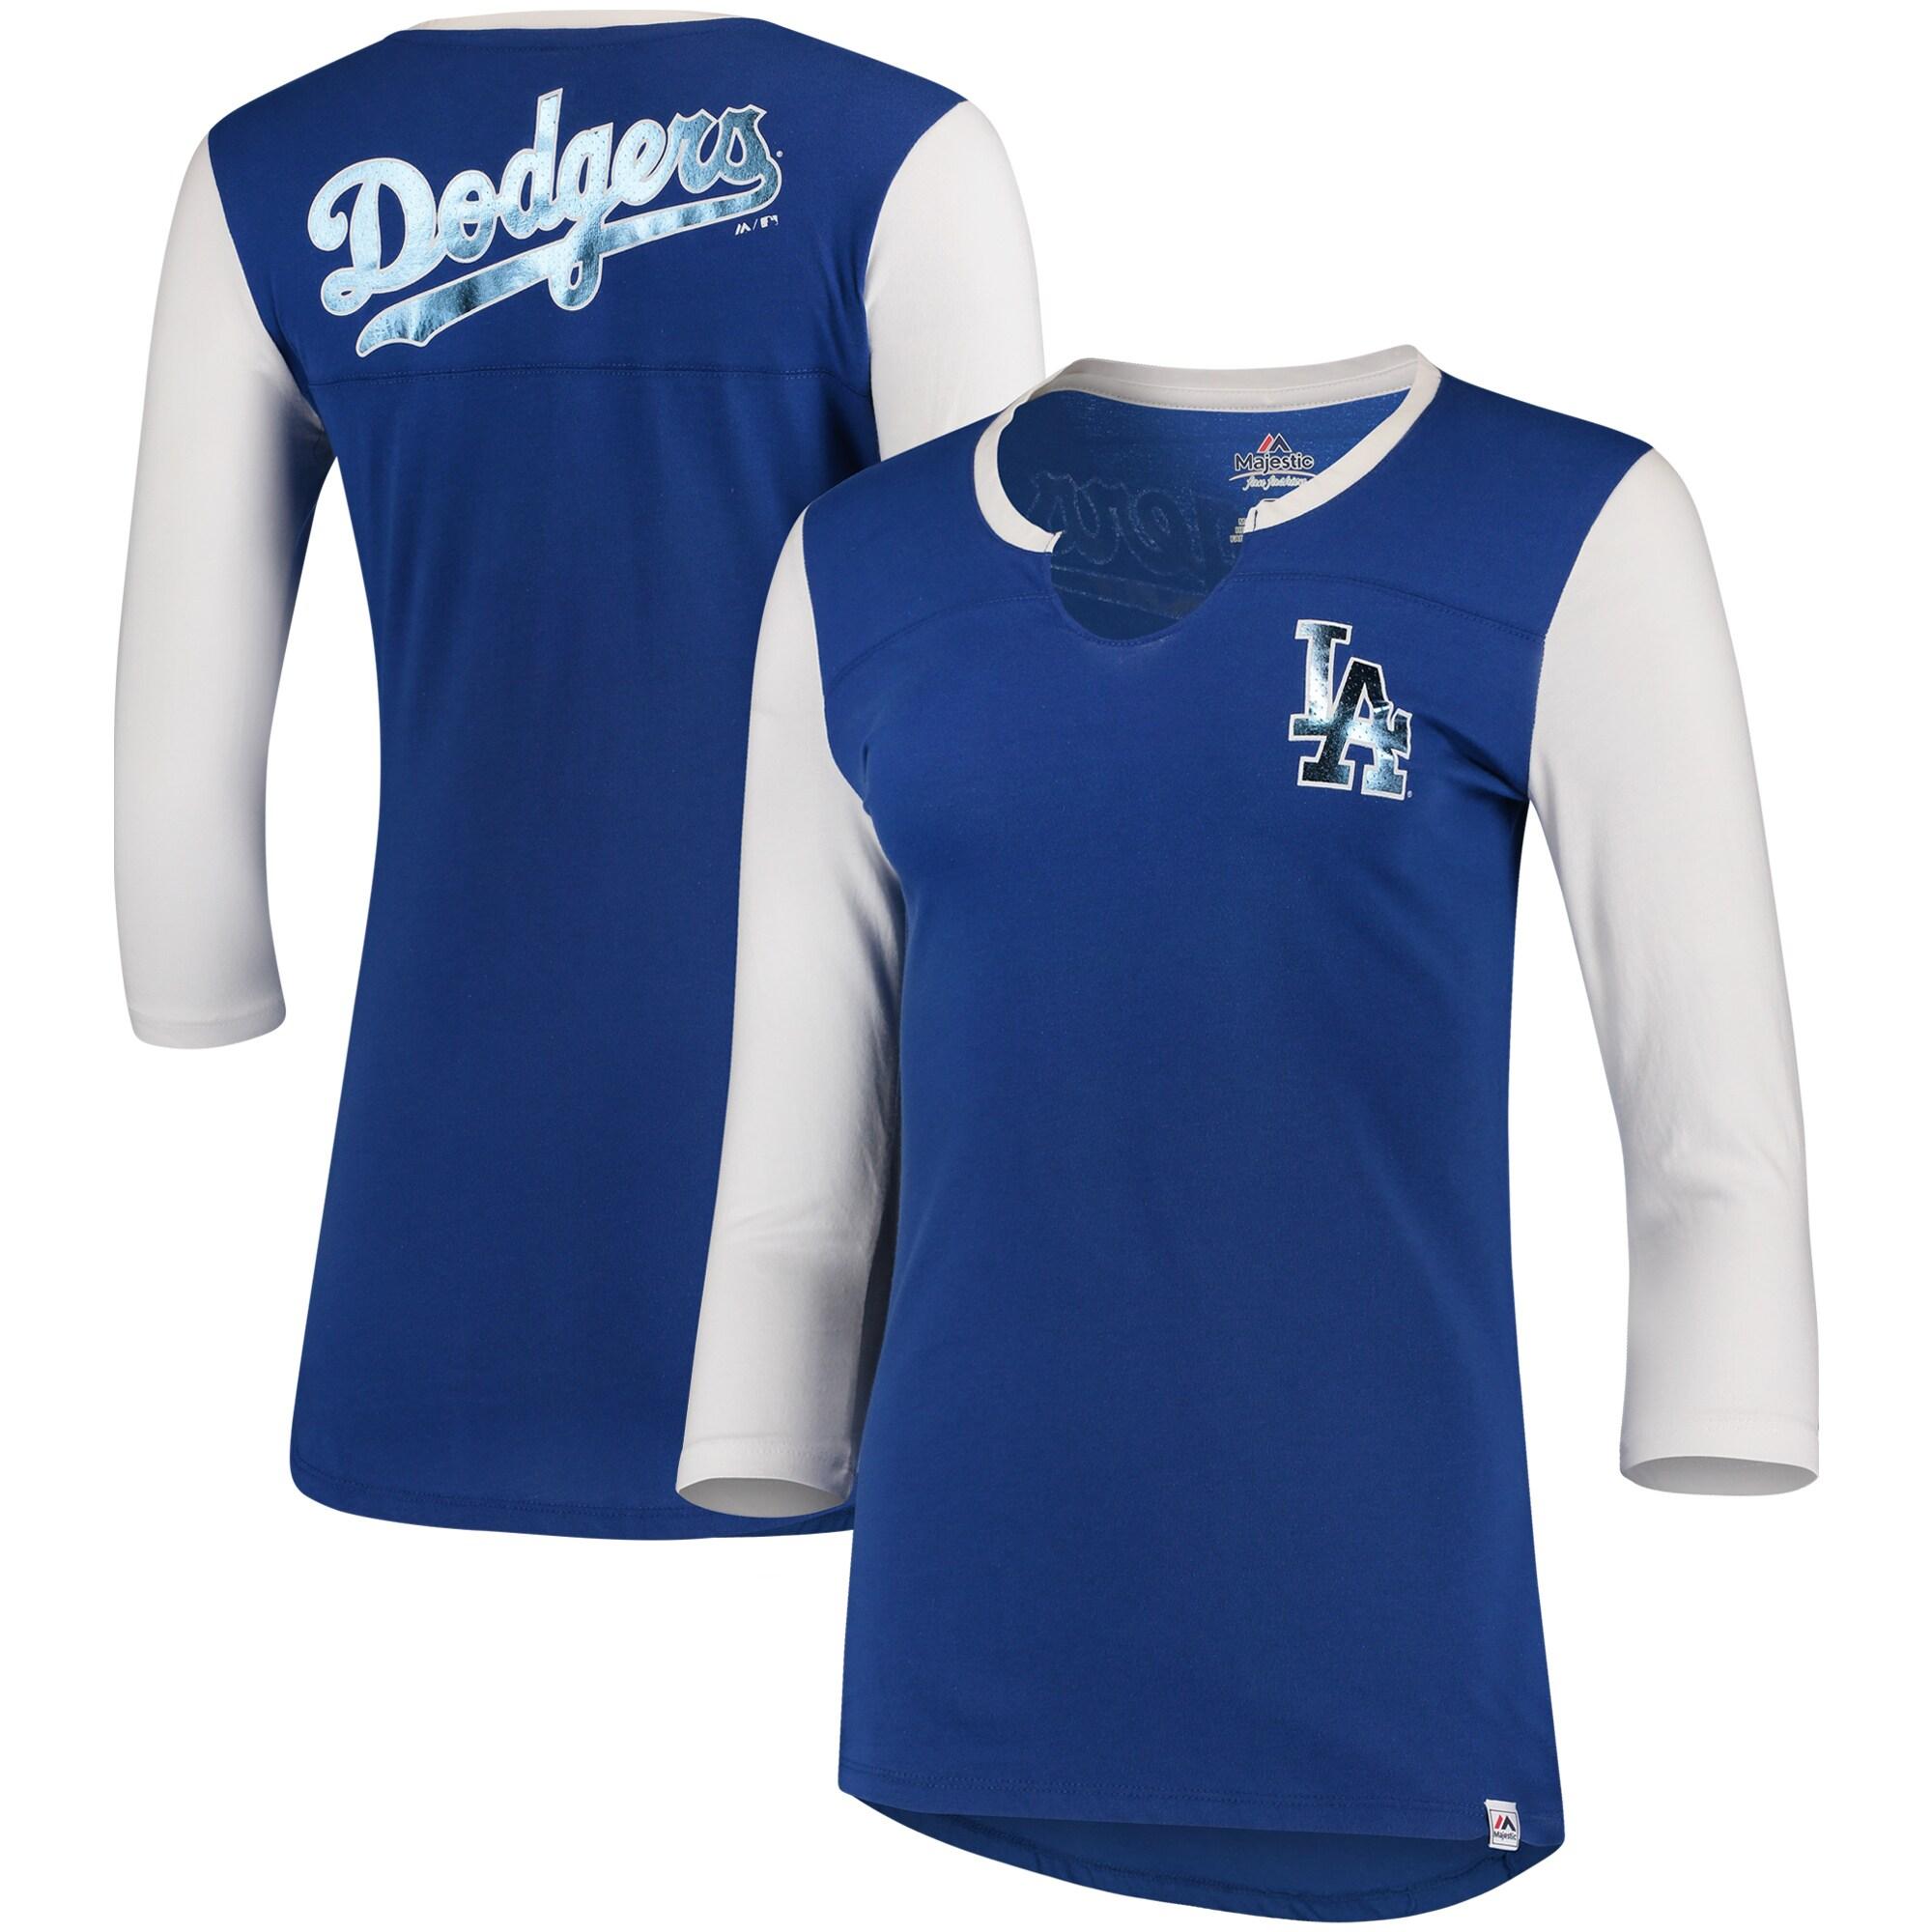 Los Angeles Dodgers Majestic Women's Above Average Three-Quarter Sleeve V-Notch T-Shirt - Royal/White